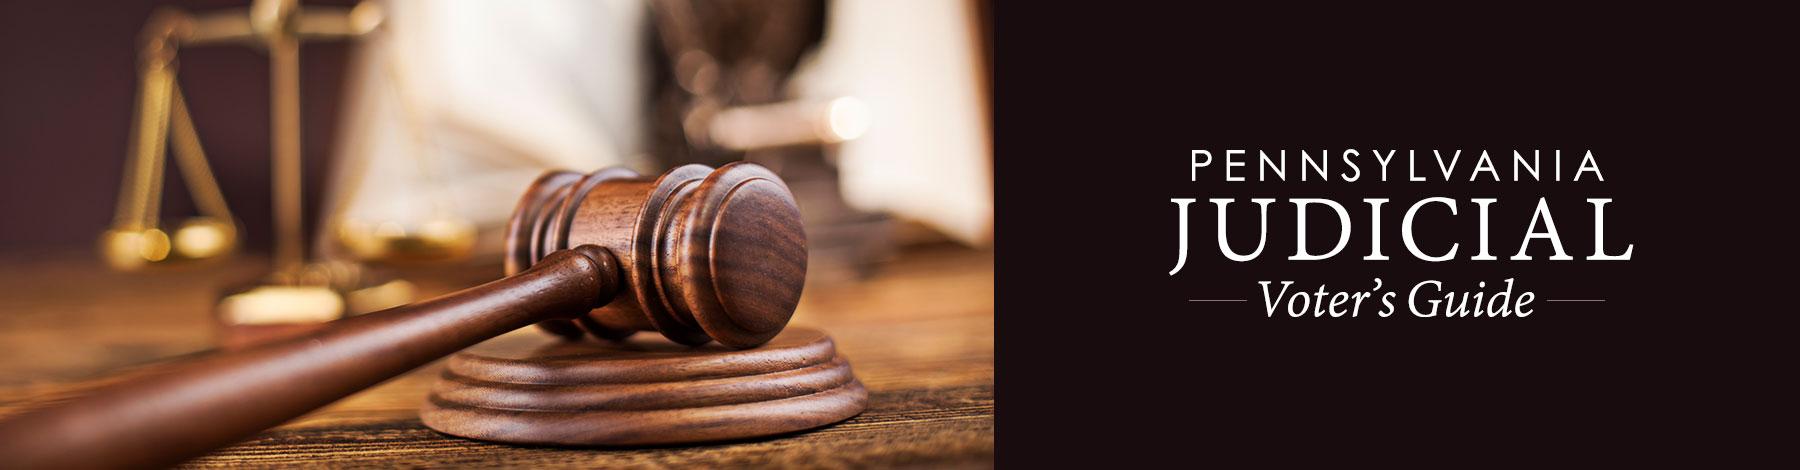 PA-Judicial-Voters-Guide-Rotator-10-15-15